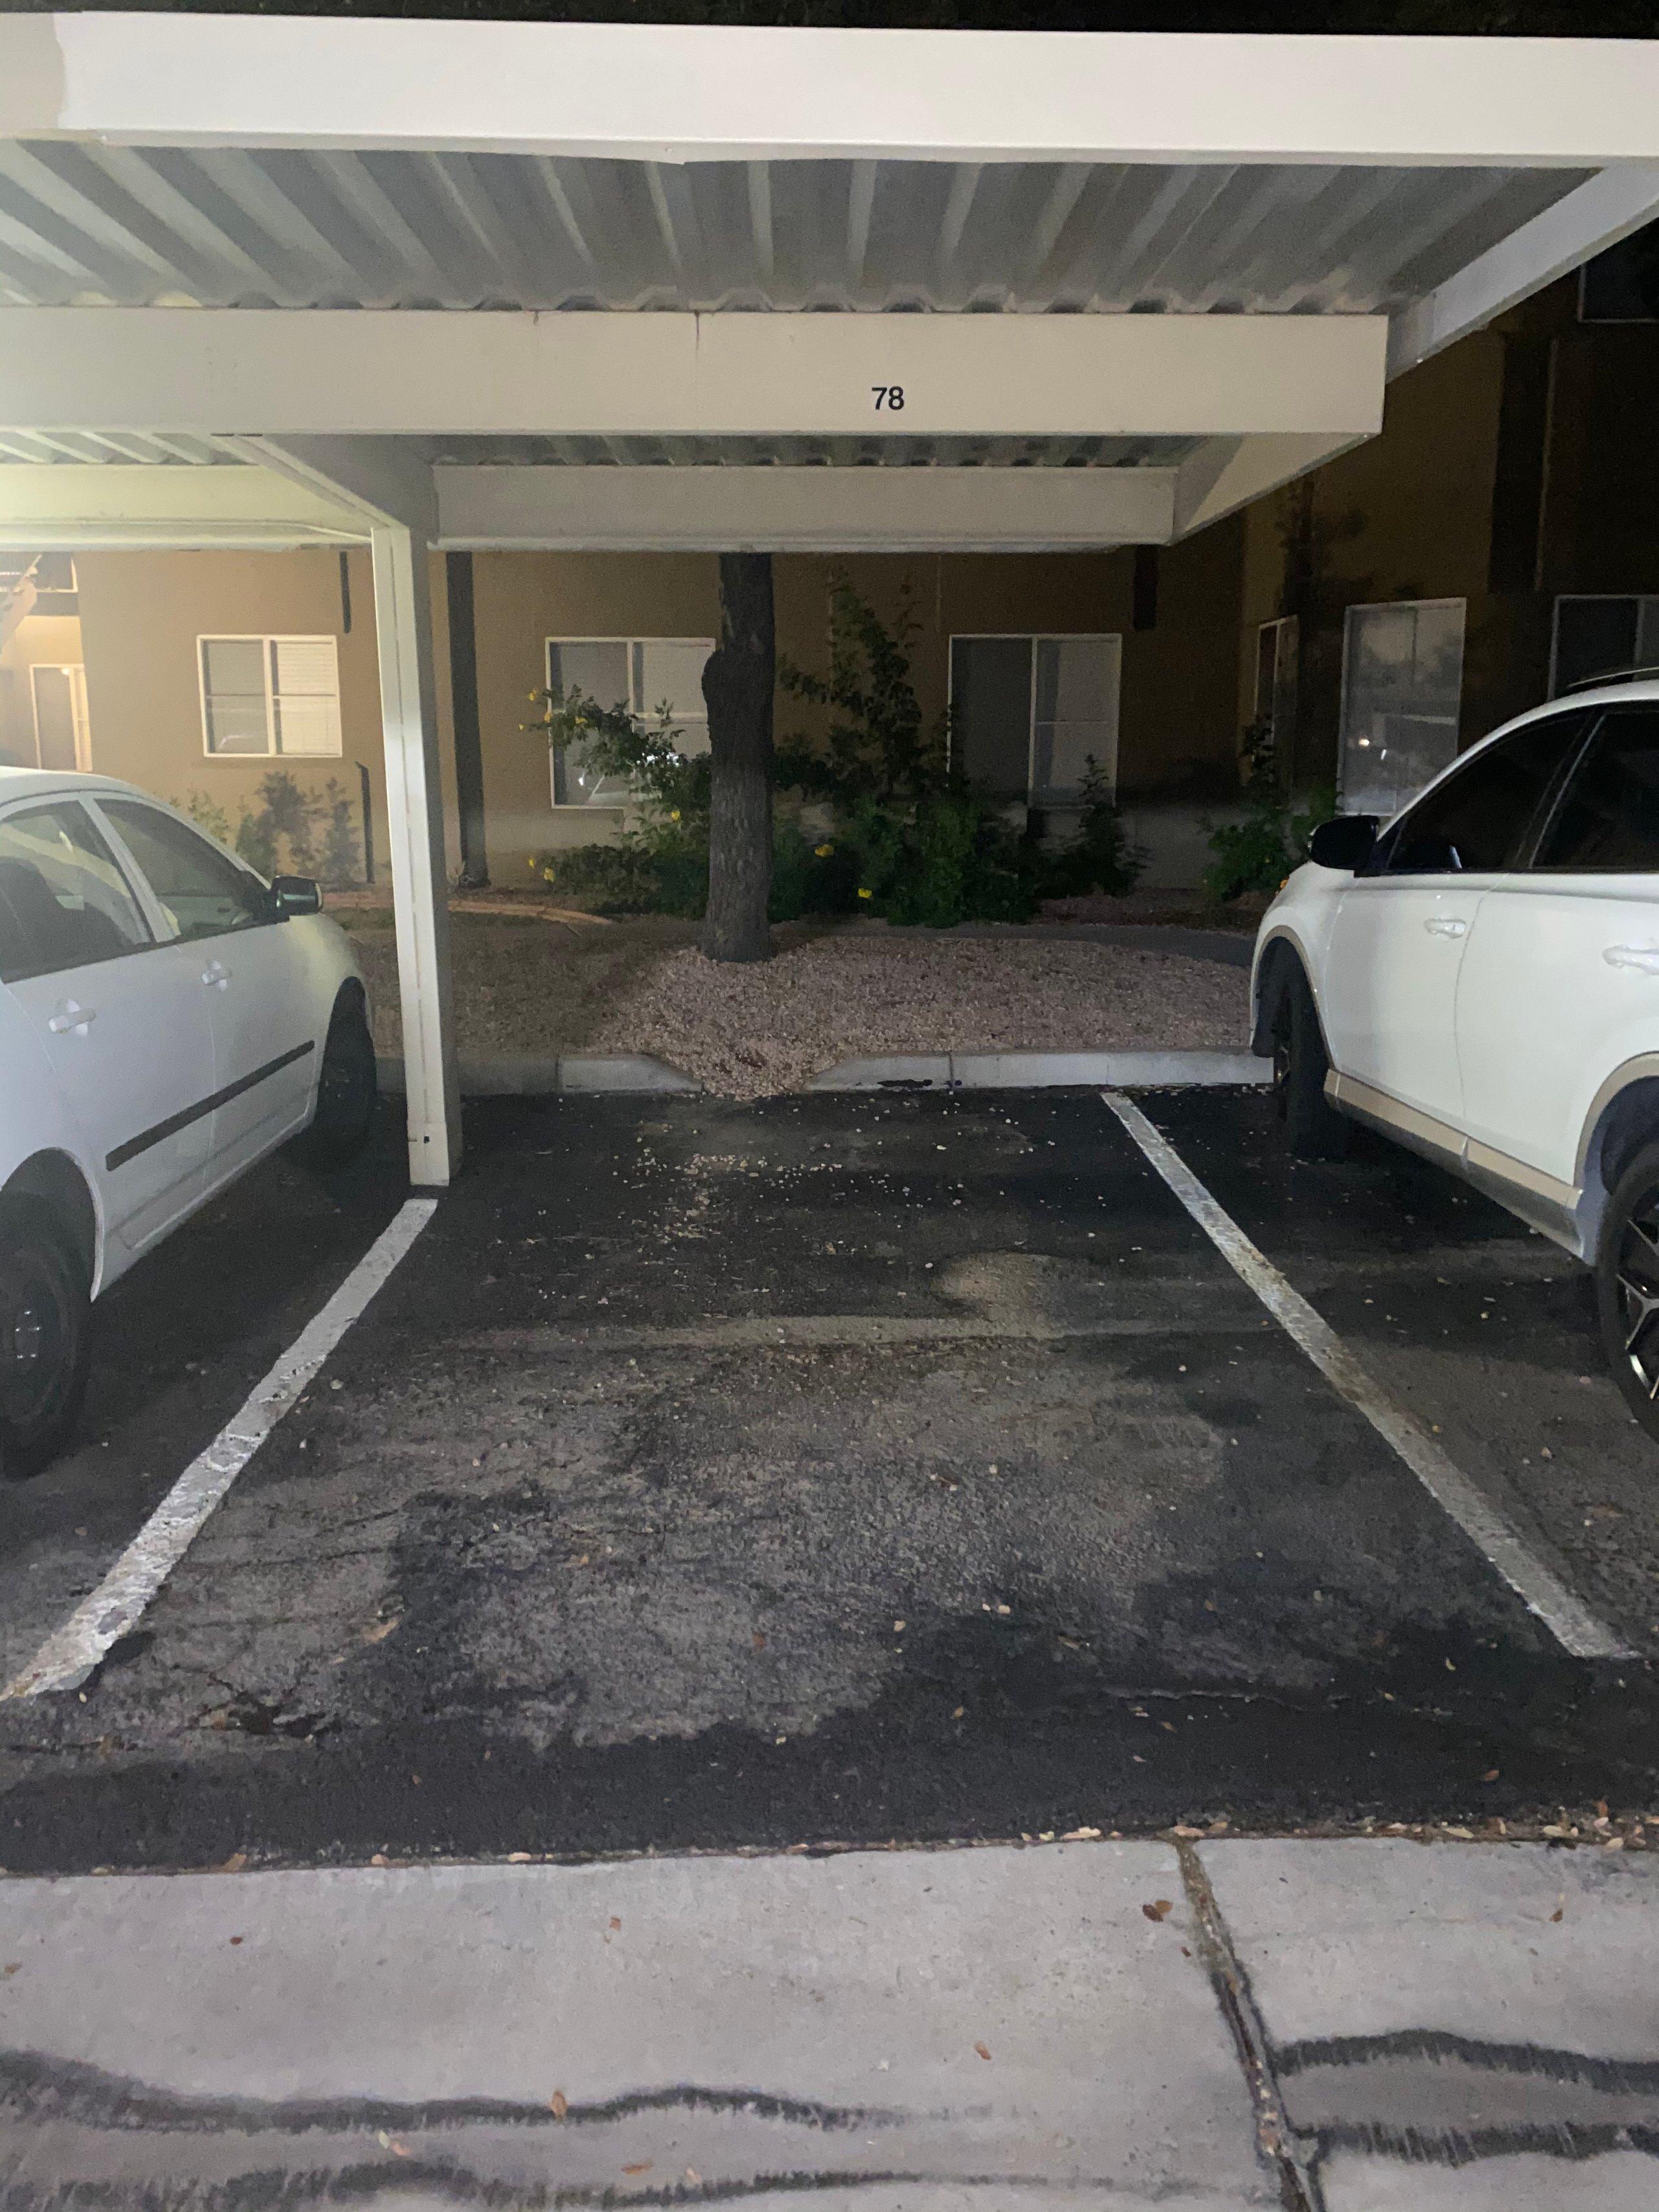 15x8 Parking Lot self storage unit